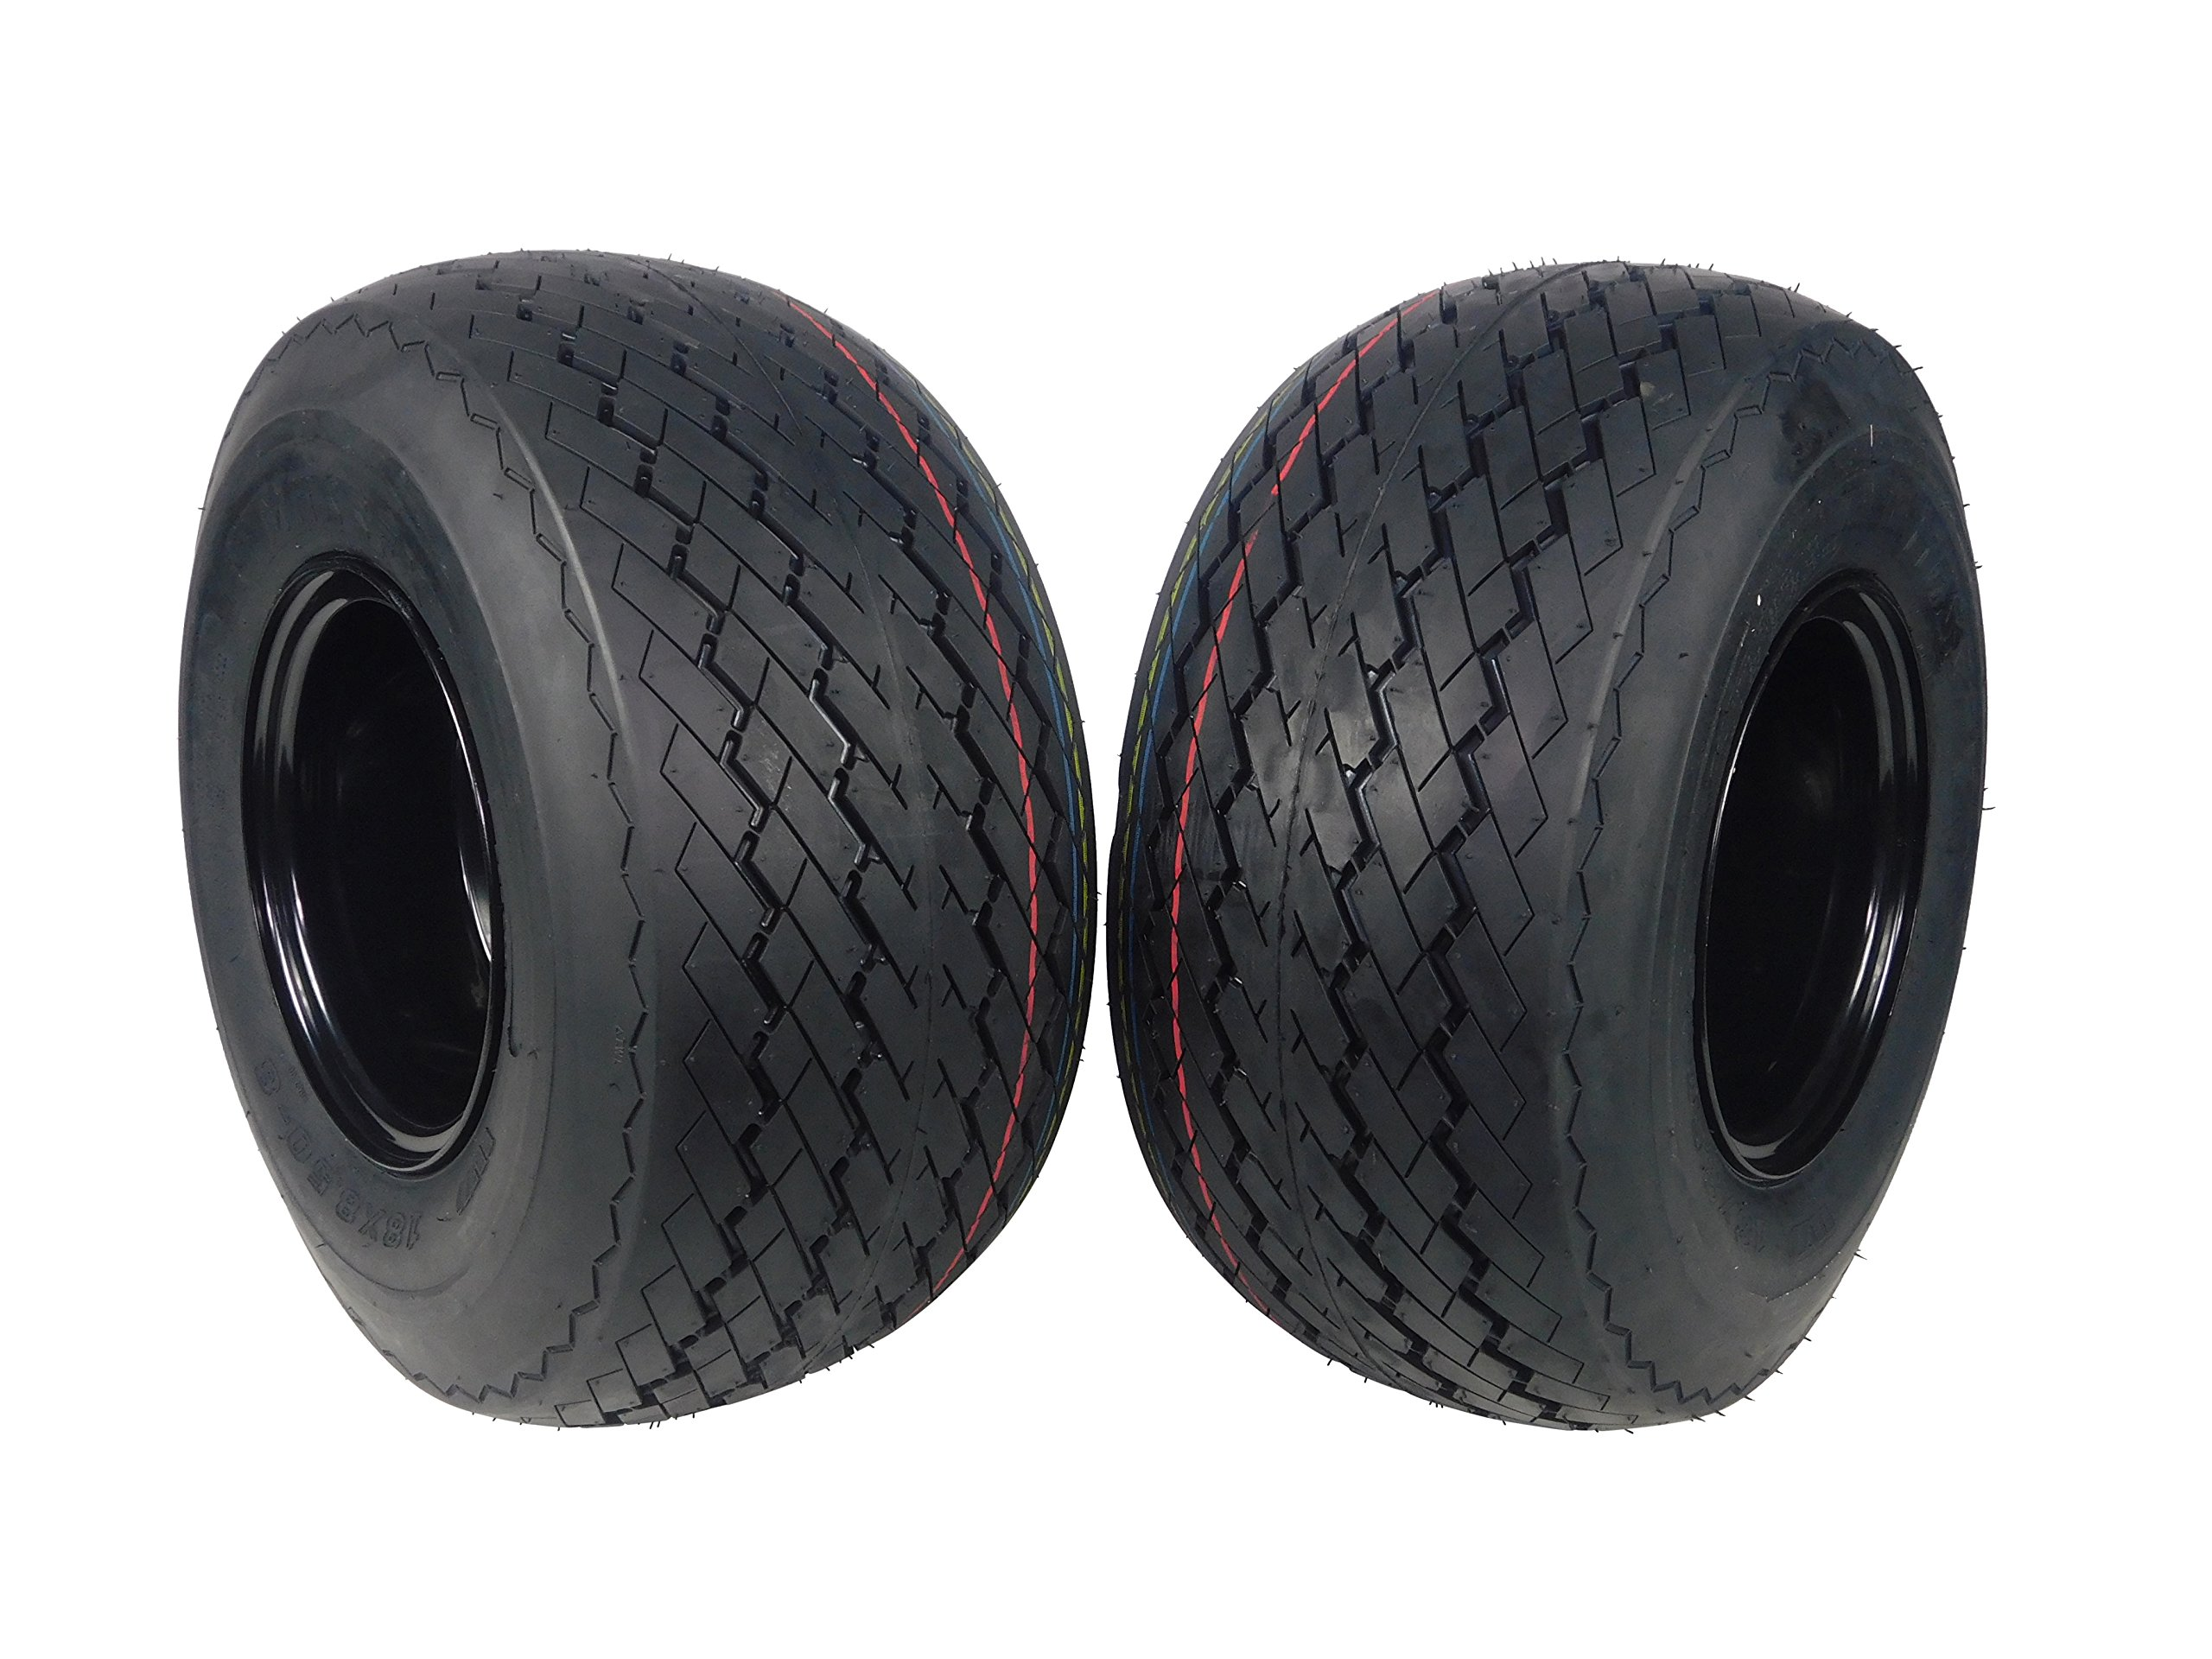 MASSFX Wheel & Tire Golf Cart Tire 18x8.5-8 with Black MASSFX 8x7 4/4 Rim 2 PACK